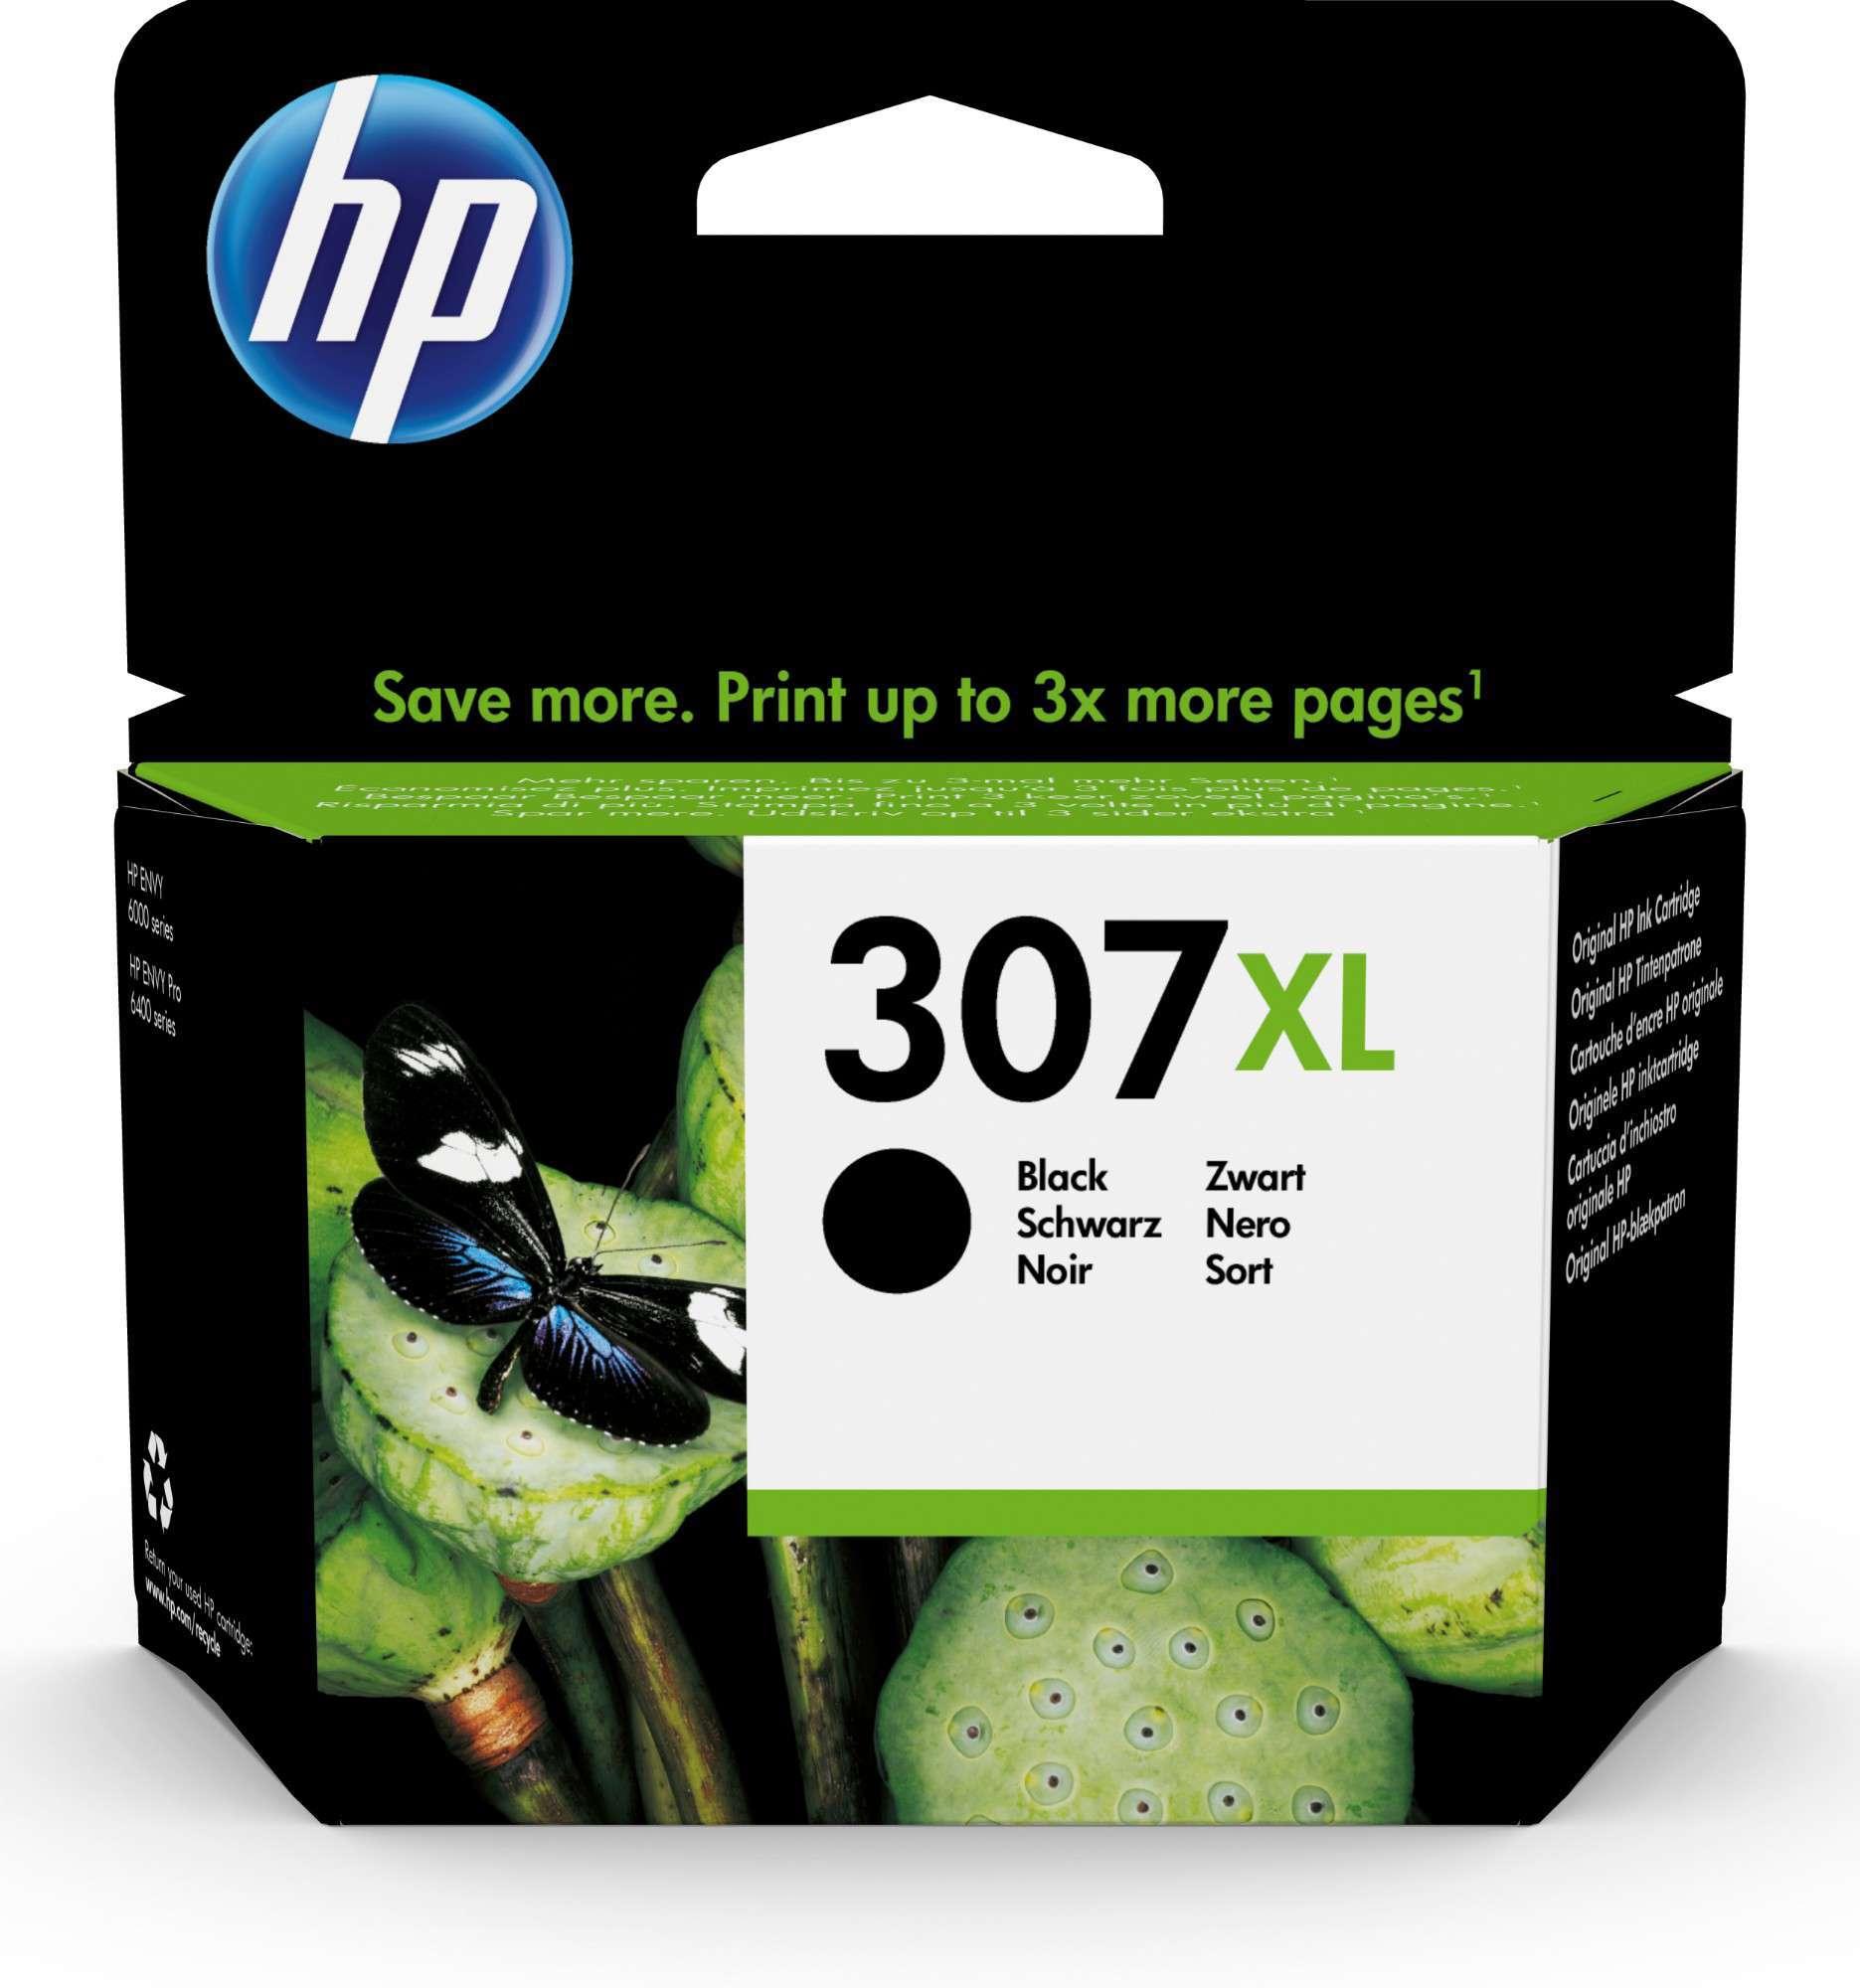 HP Original 307XL Black High Capacity Inkjet Cartridge 3YM64AE